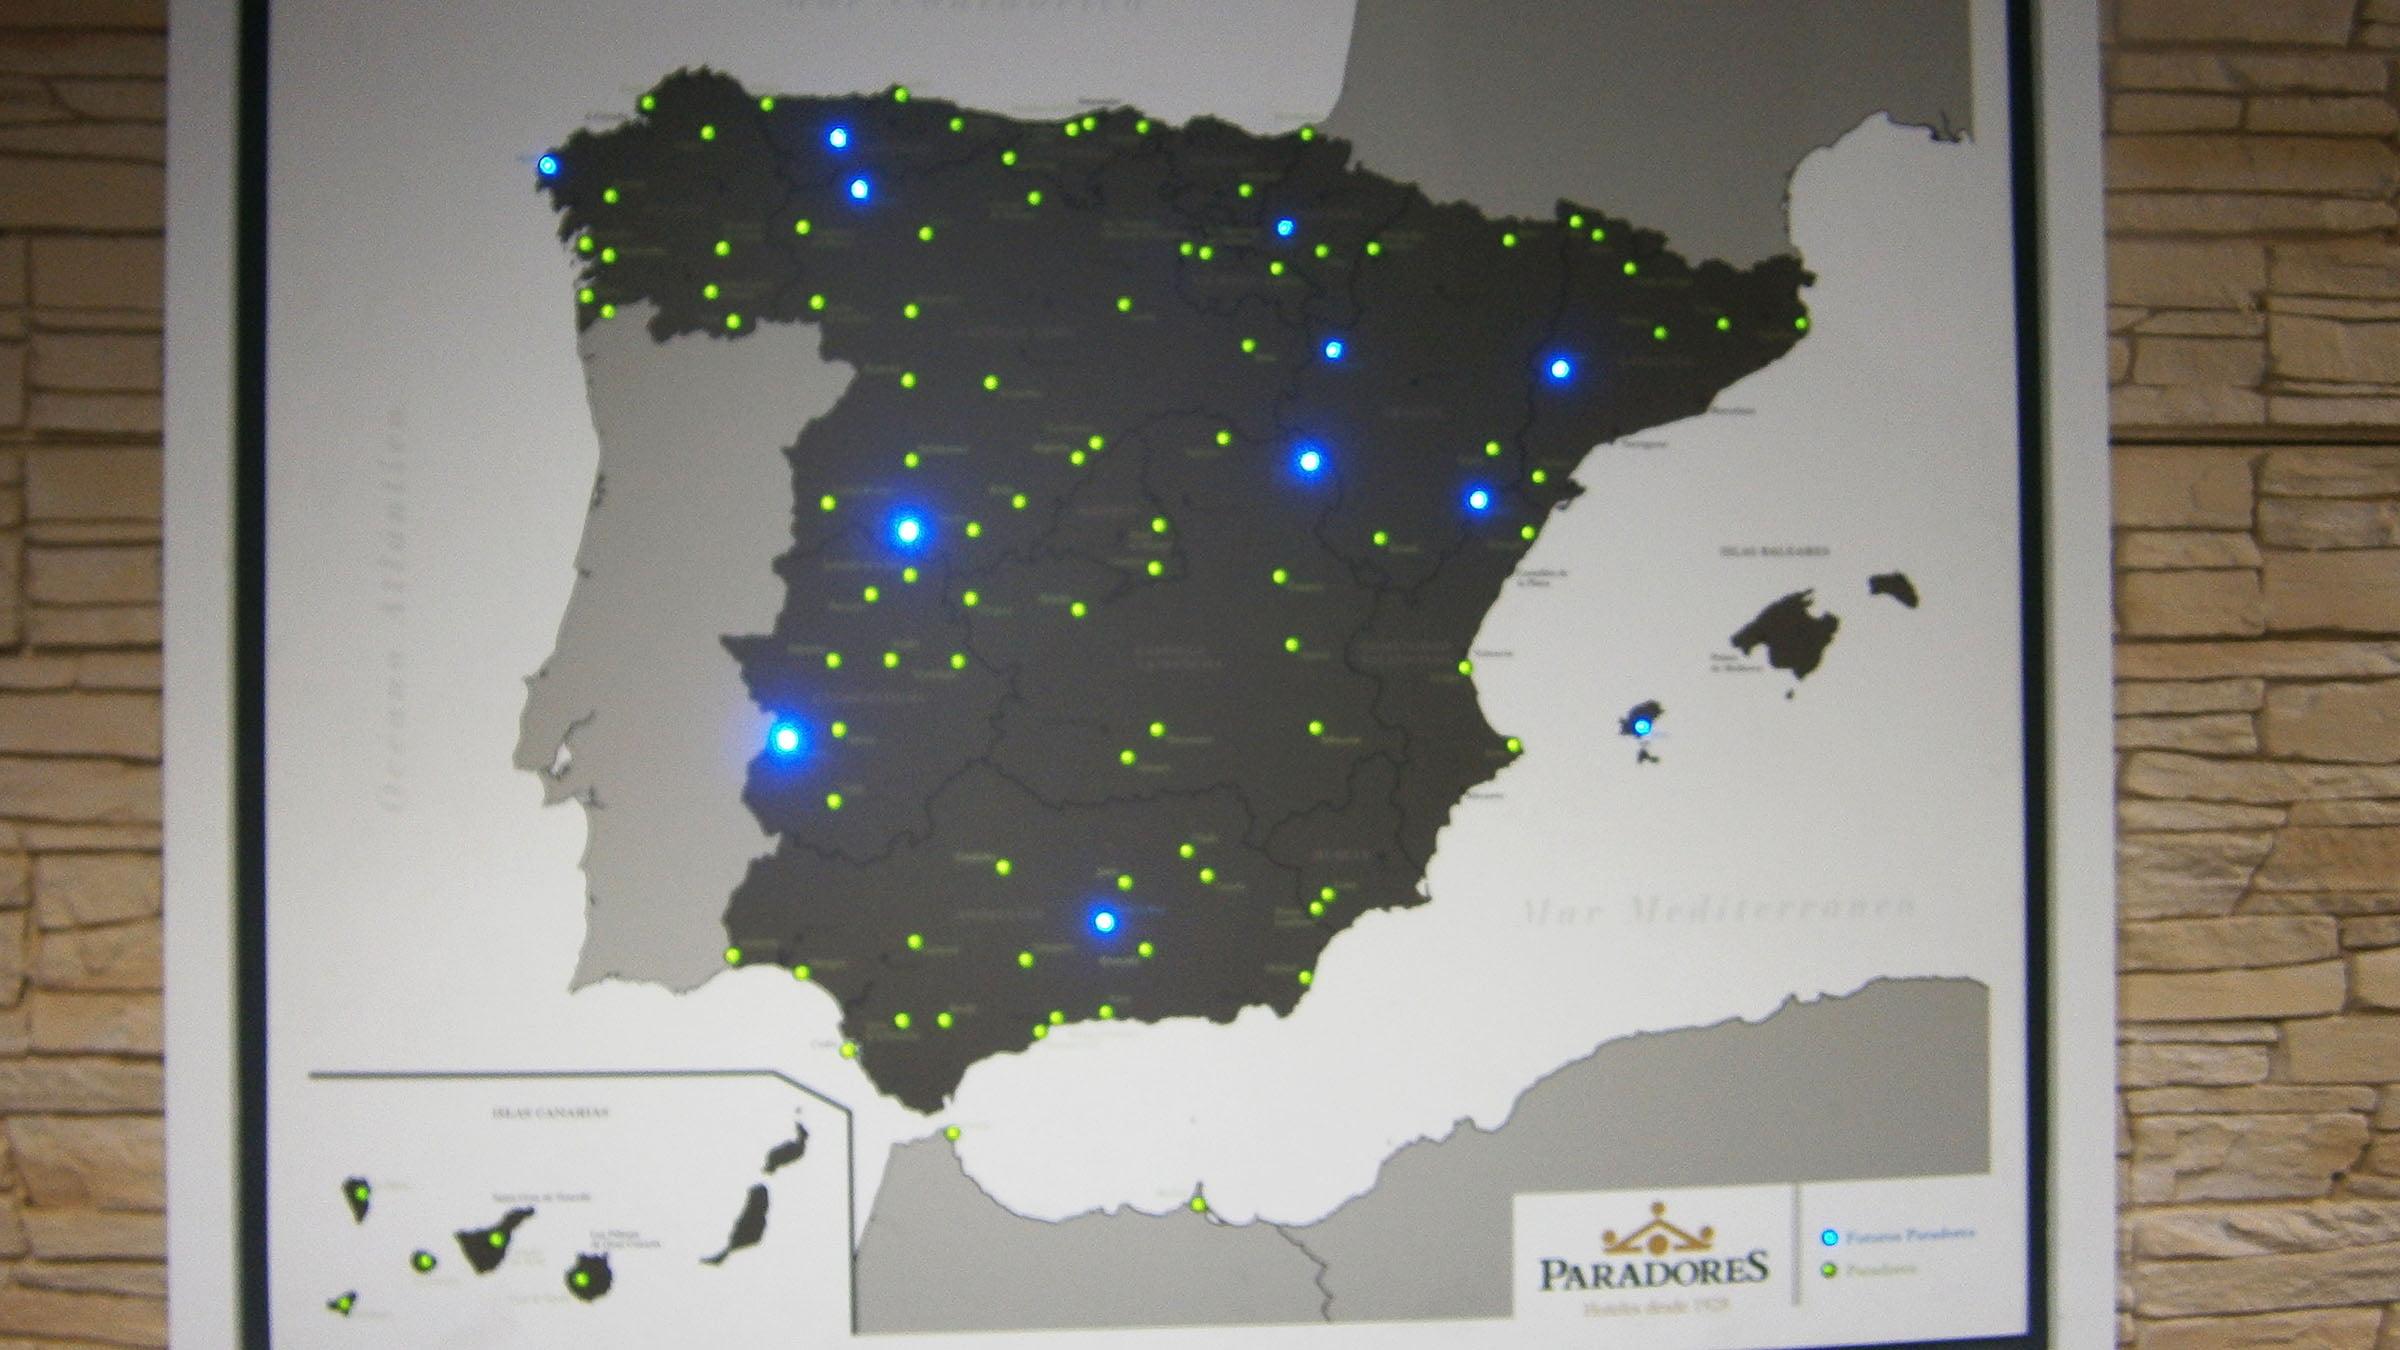 Paradores De España Mapa.Mapa De La Red De Paradores De Espana